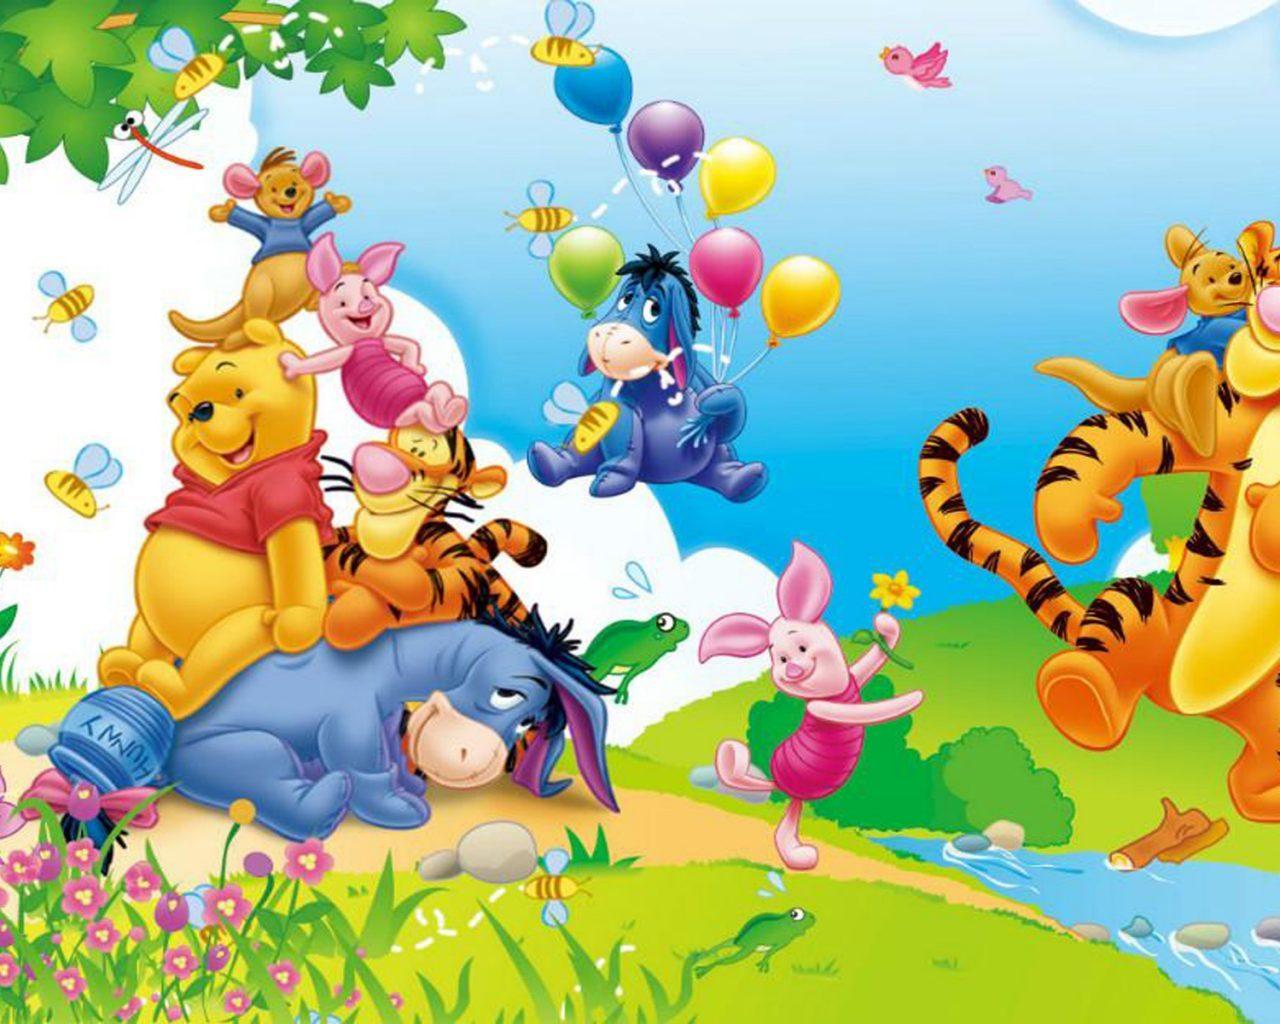 Winnie The Pooh Eeyore Piglet Tigger And Kanga Cartoon Happy